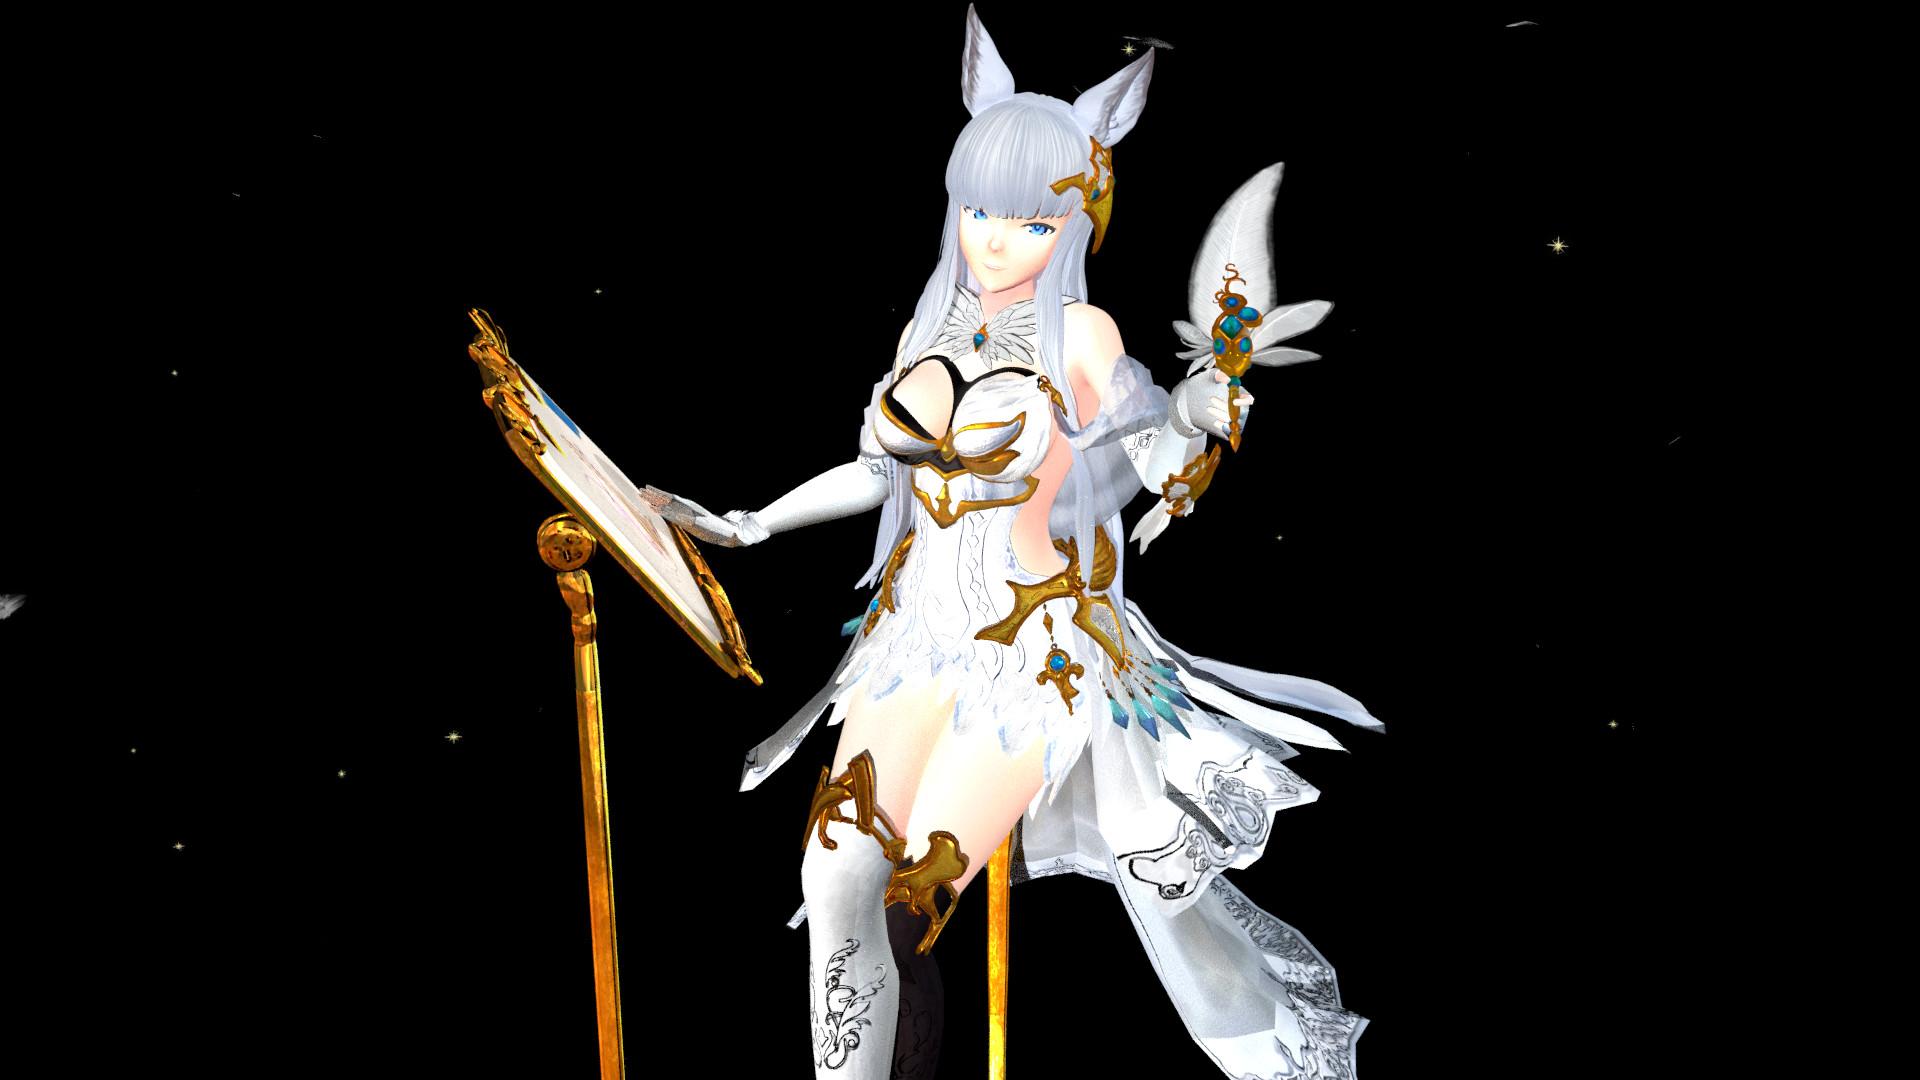 ArtStation - Korwa / コルワ - Granblue Fantasy (3D model +